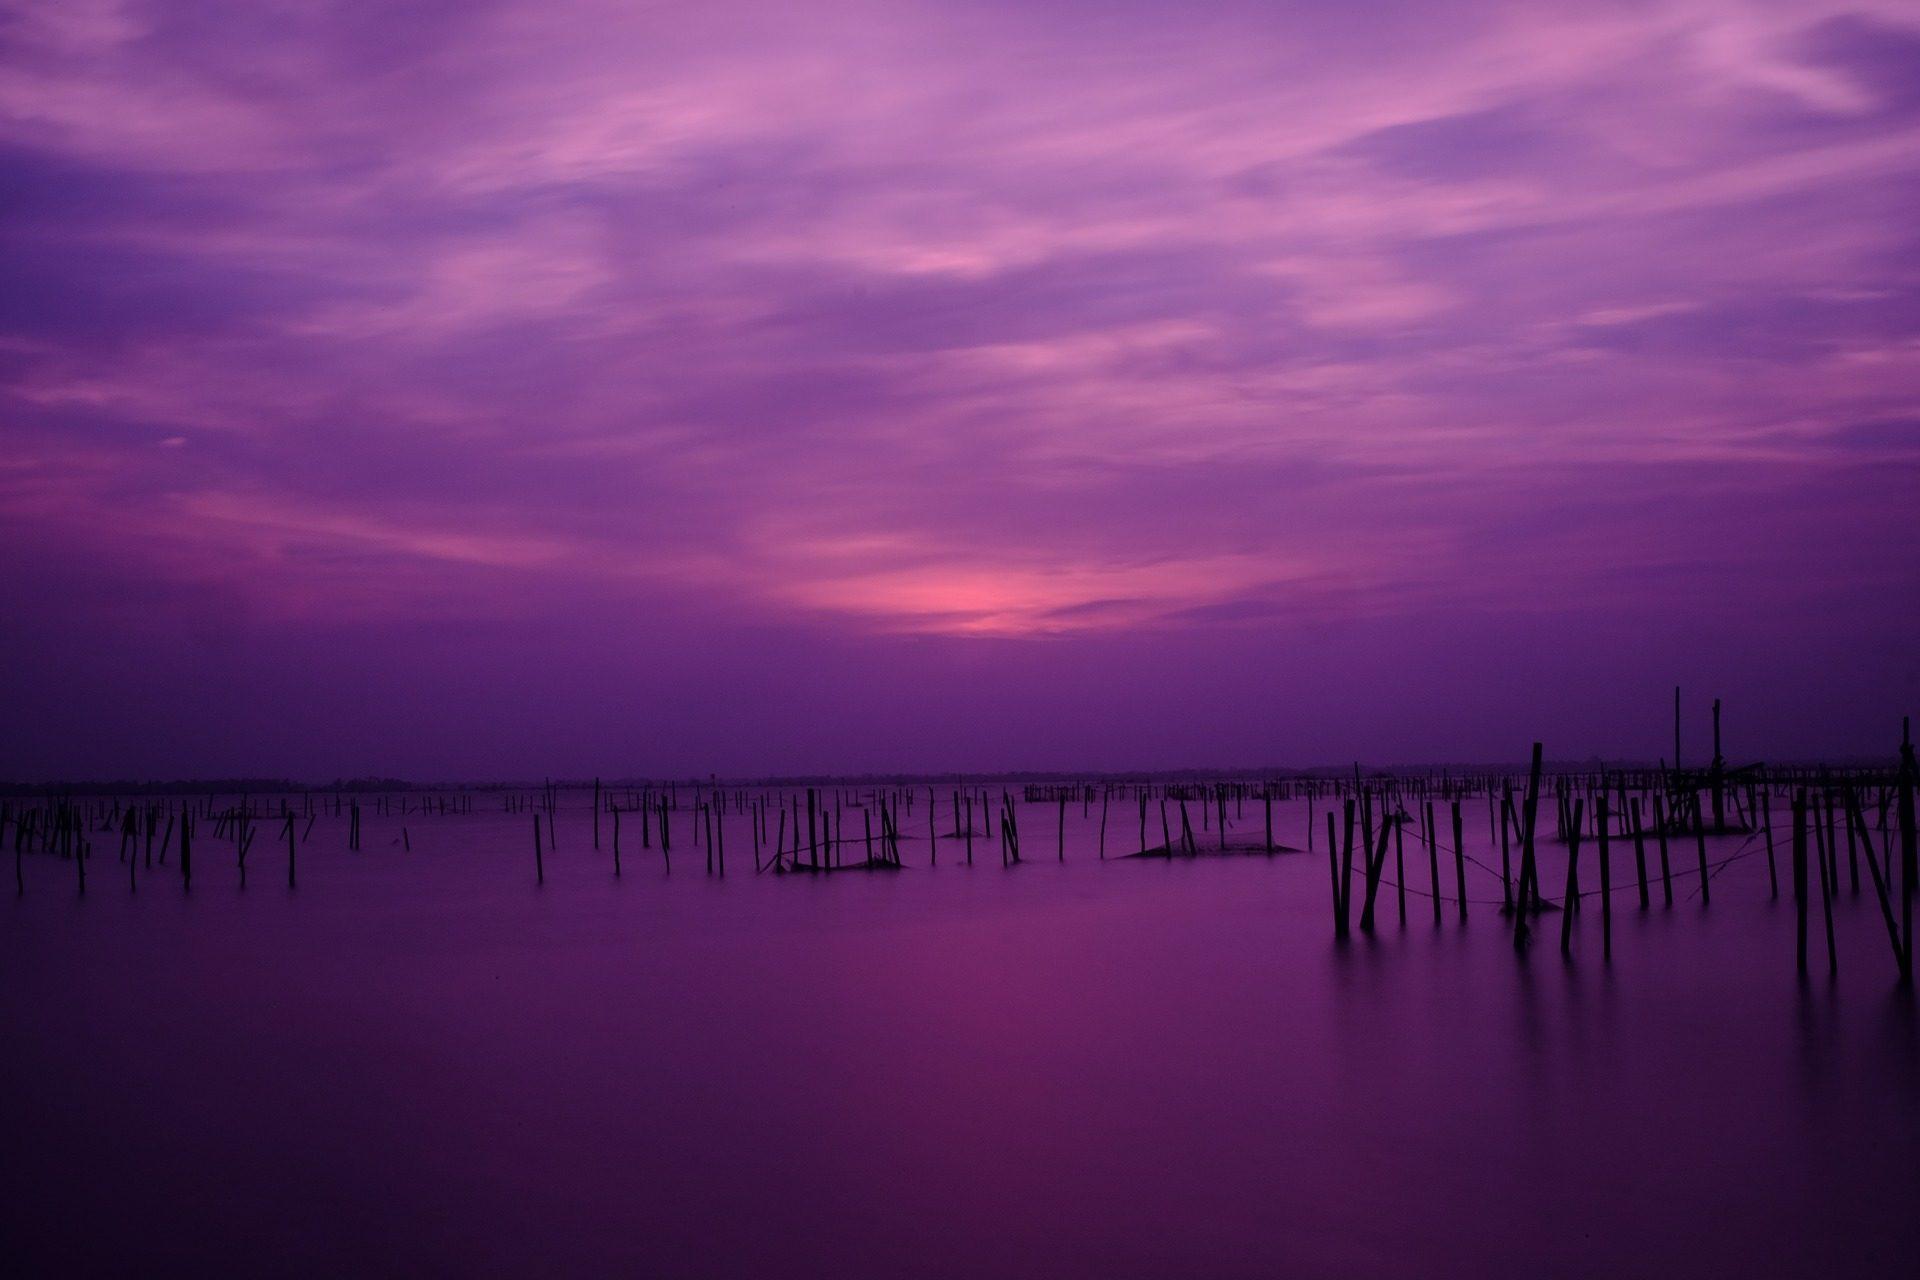 Tramonto, Cielo, Viola, Laguna, TAM giang, Vietnam - Sfondi HD - Professor-falken.com